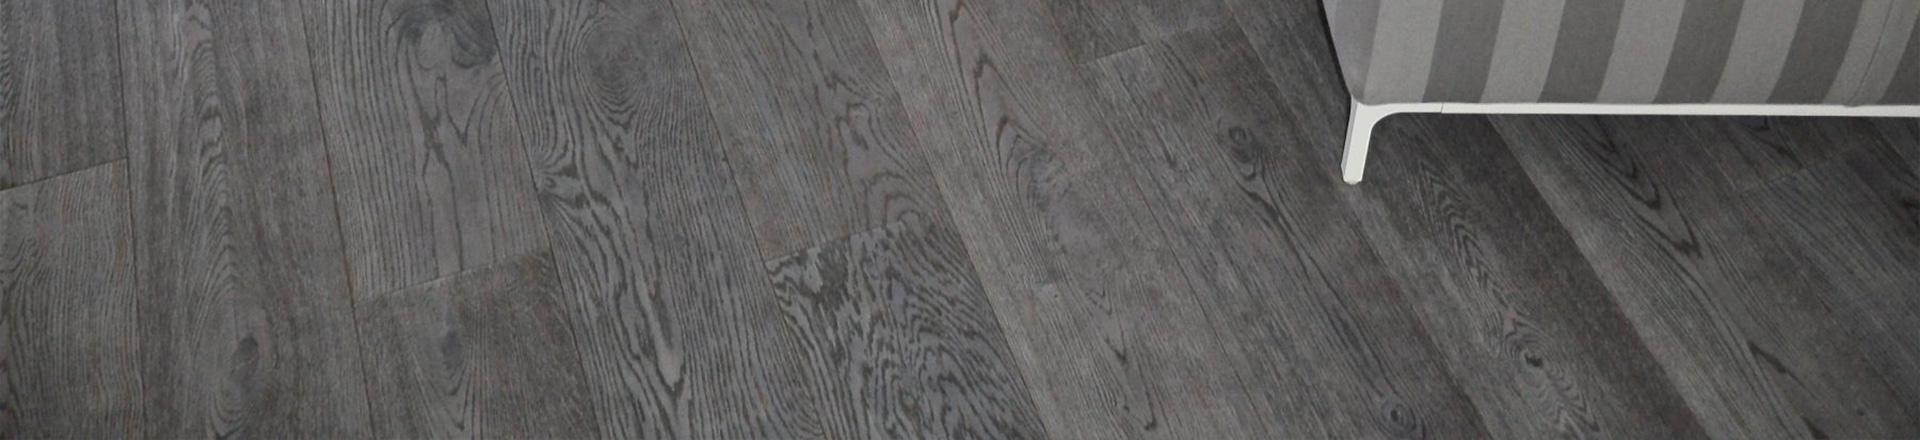 pavimento rovere grigio